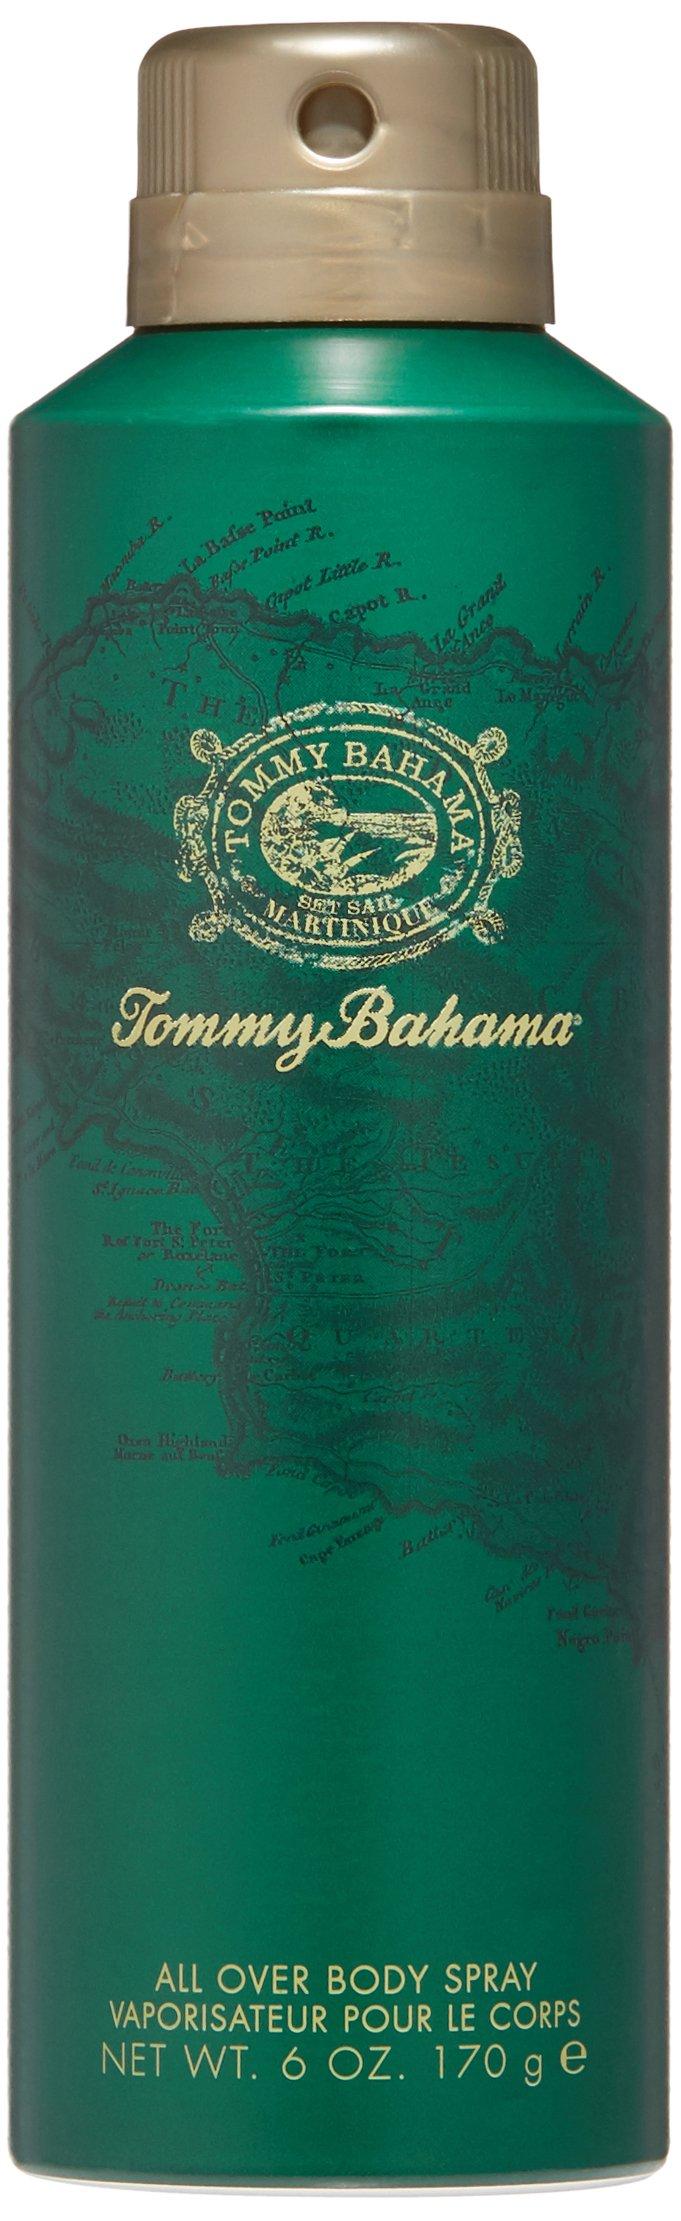 Tommy Bahama Body Spray , 6.0 oz by Tommy Bahama